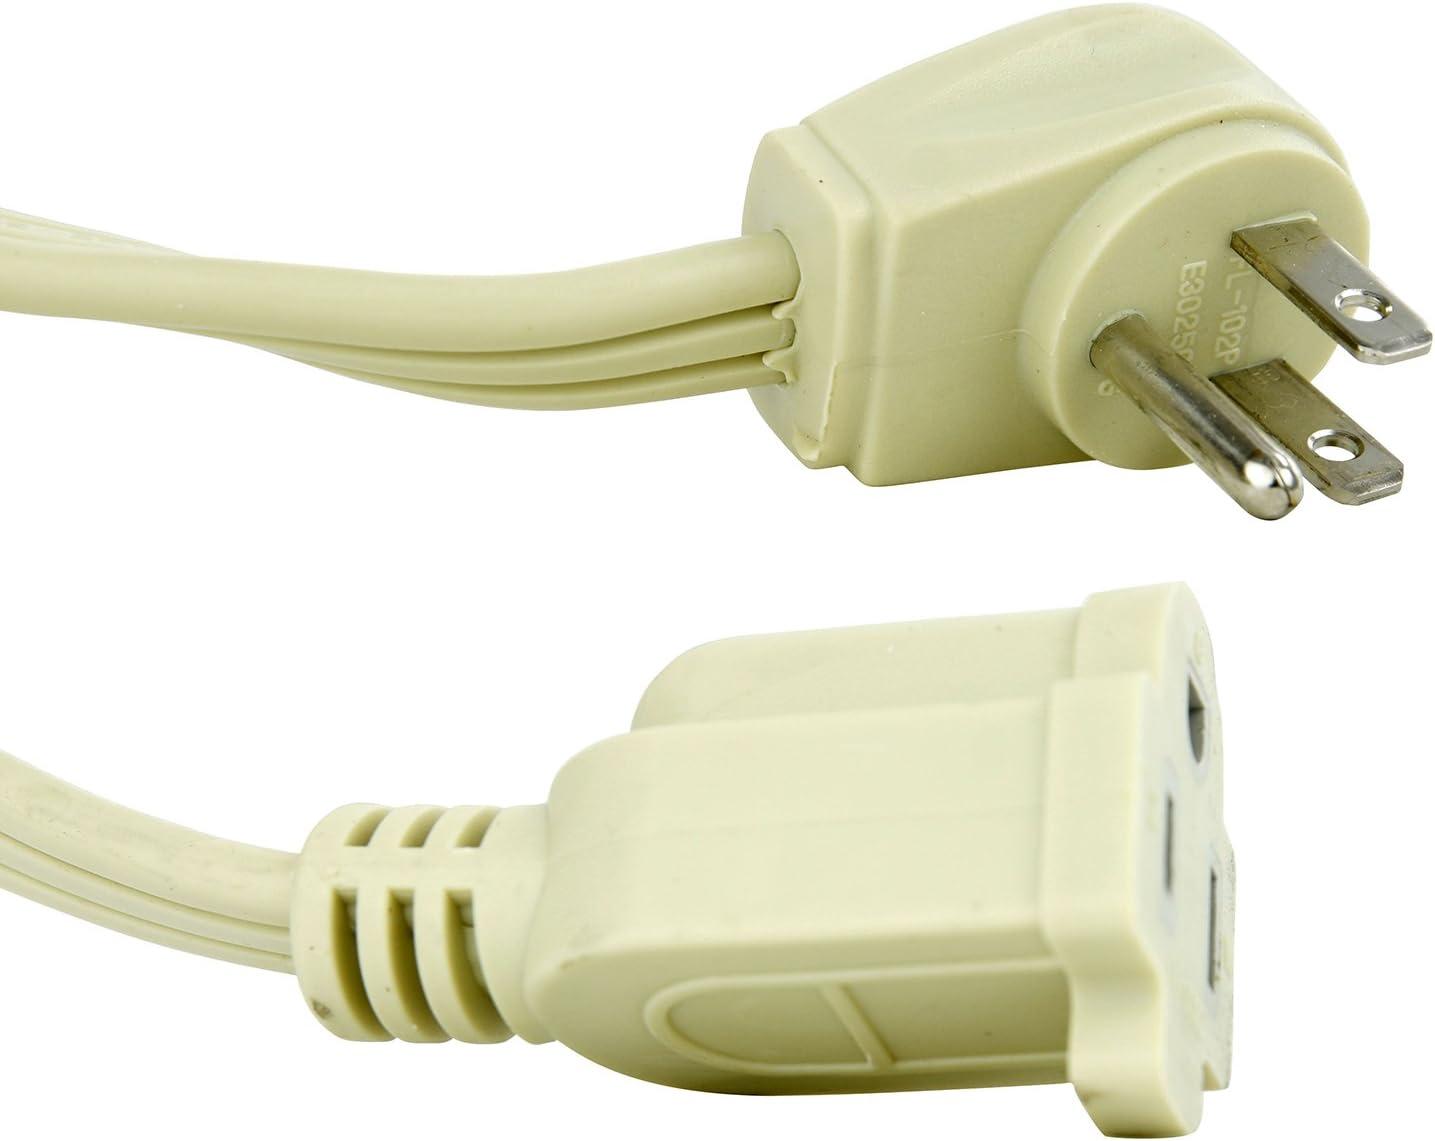 Sunlite 04160-SU EX12/AP Heavy Duty Appliance Extension Cord, Three Prong, 14/3 Gauge, 15 Amp, 12', Beige